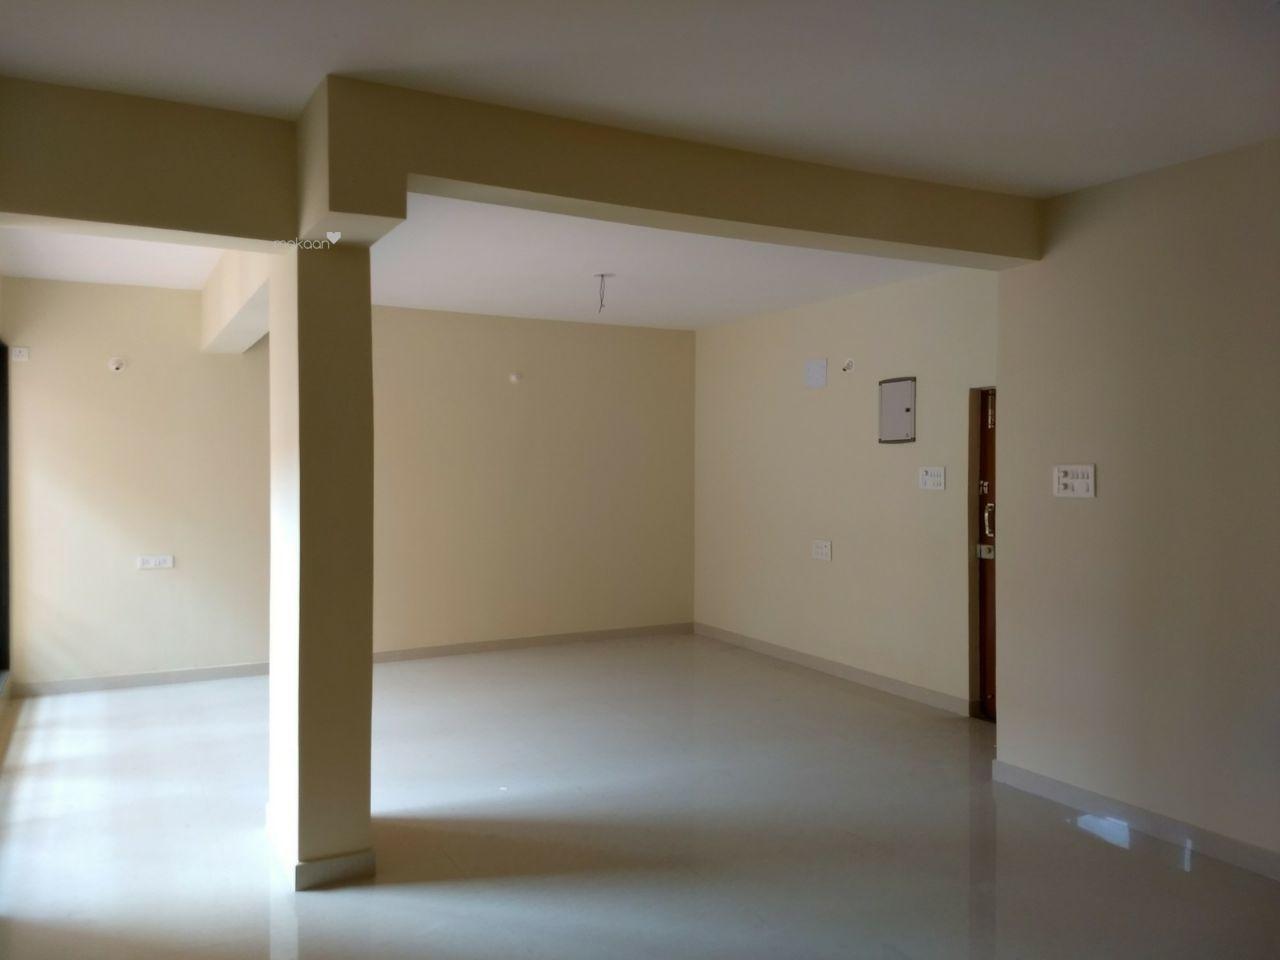 1022 sq ft 2BHK 2BHK+2T (1,022 sq ft) Property By Viva Goa Property In Project, Porvorim